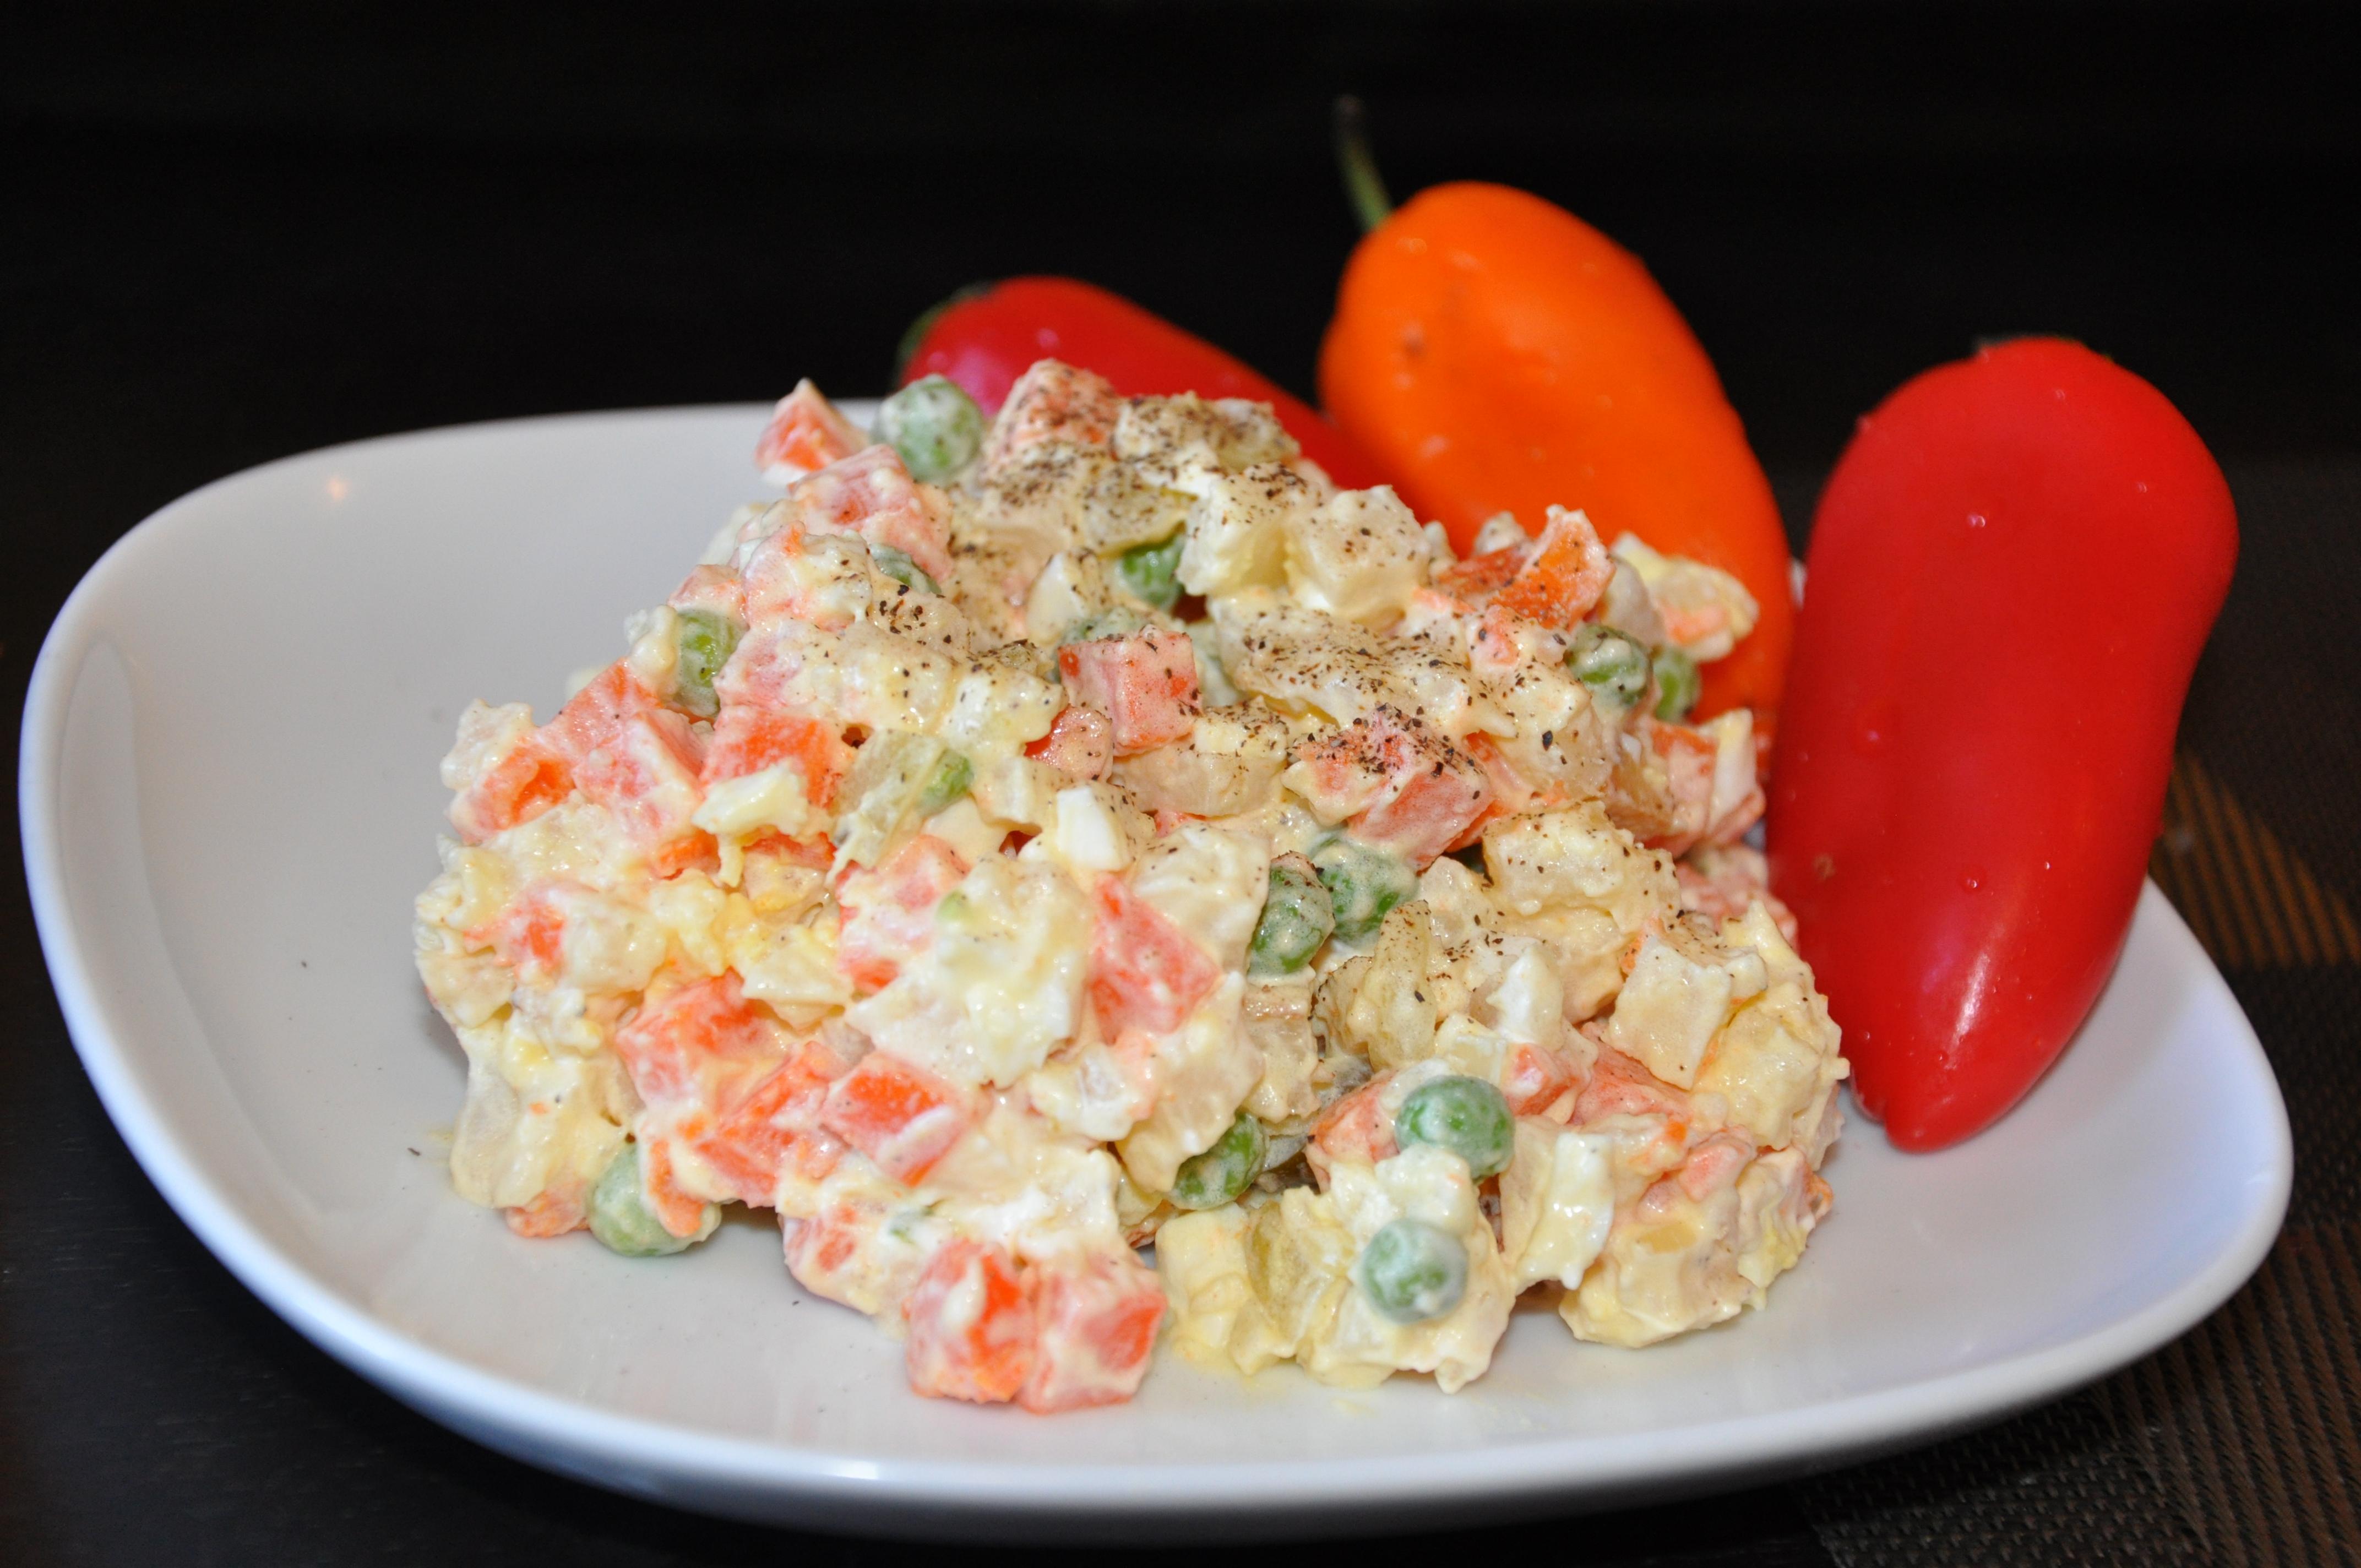 salatka jarzynowa polish vegetable salad 015